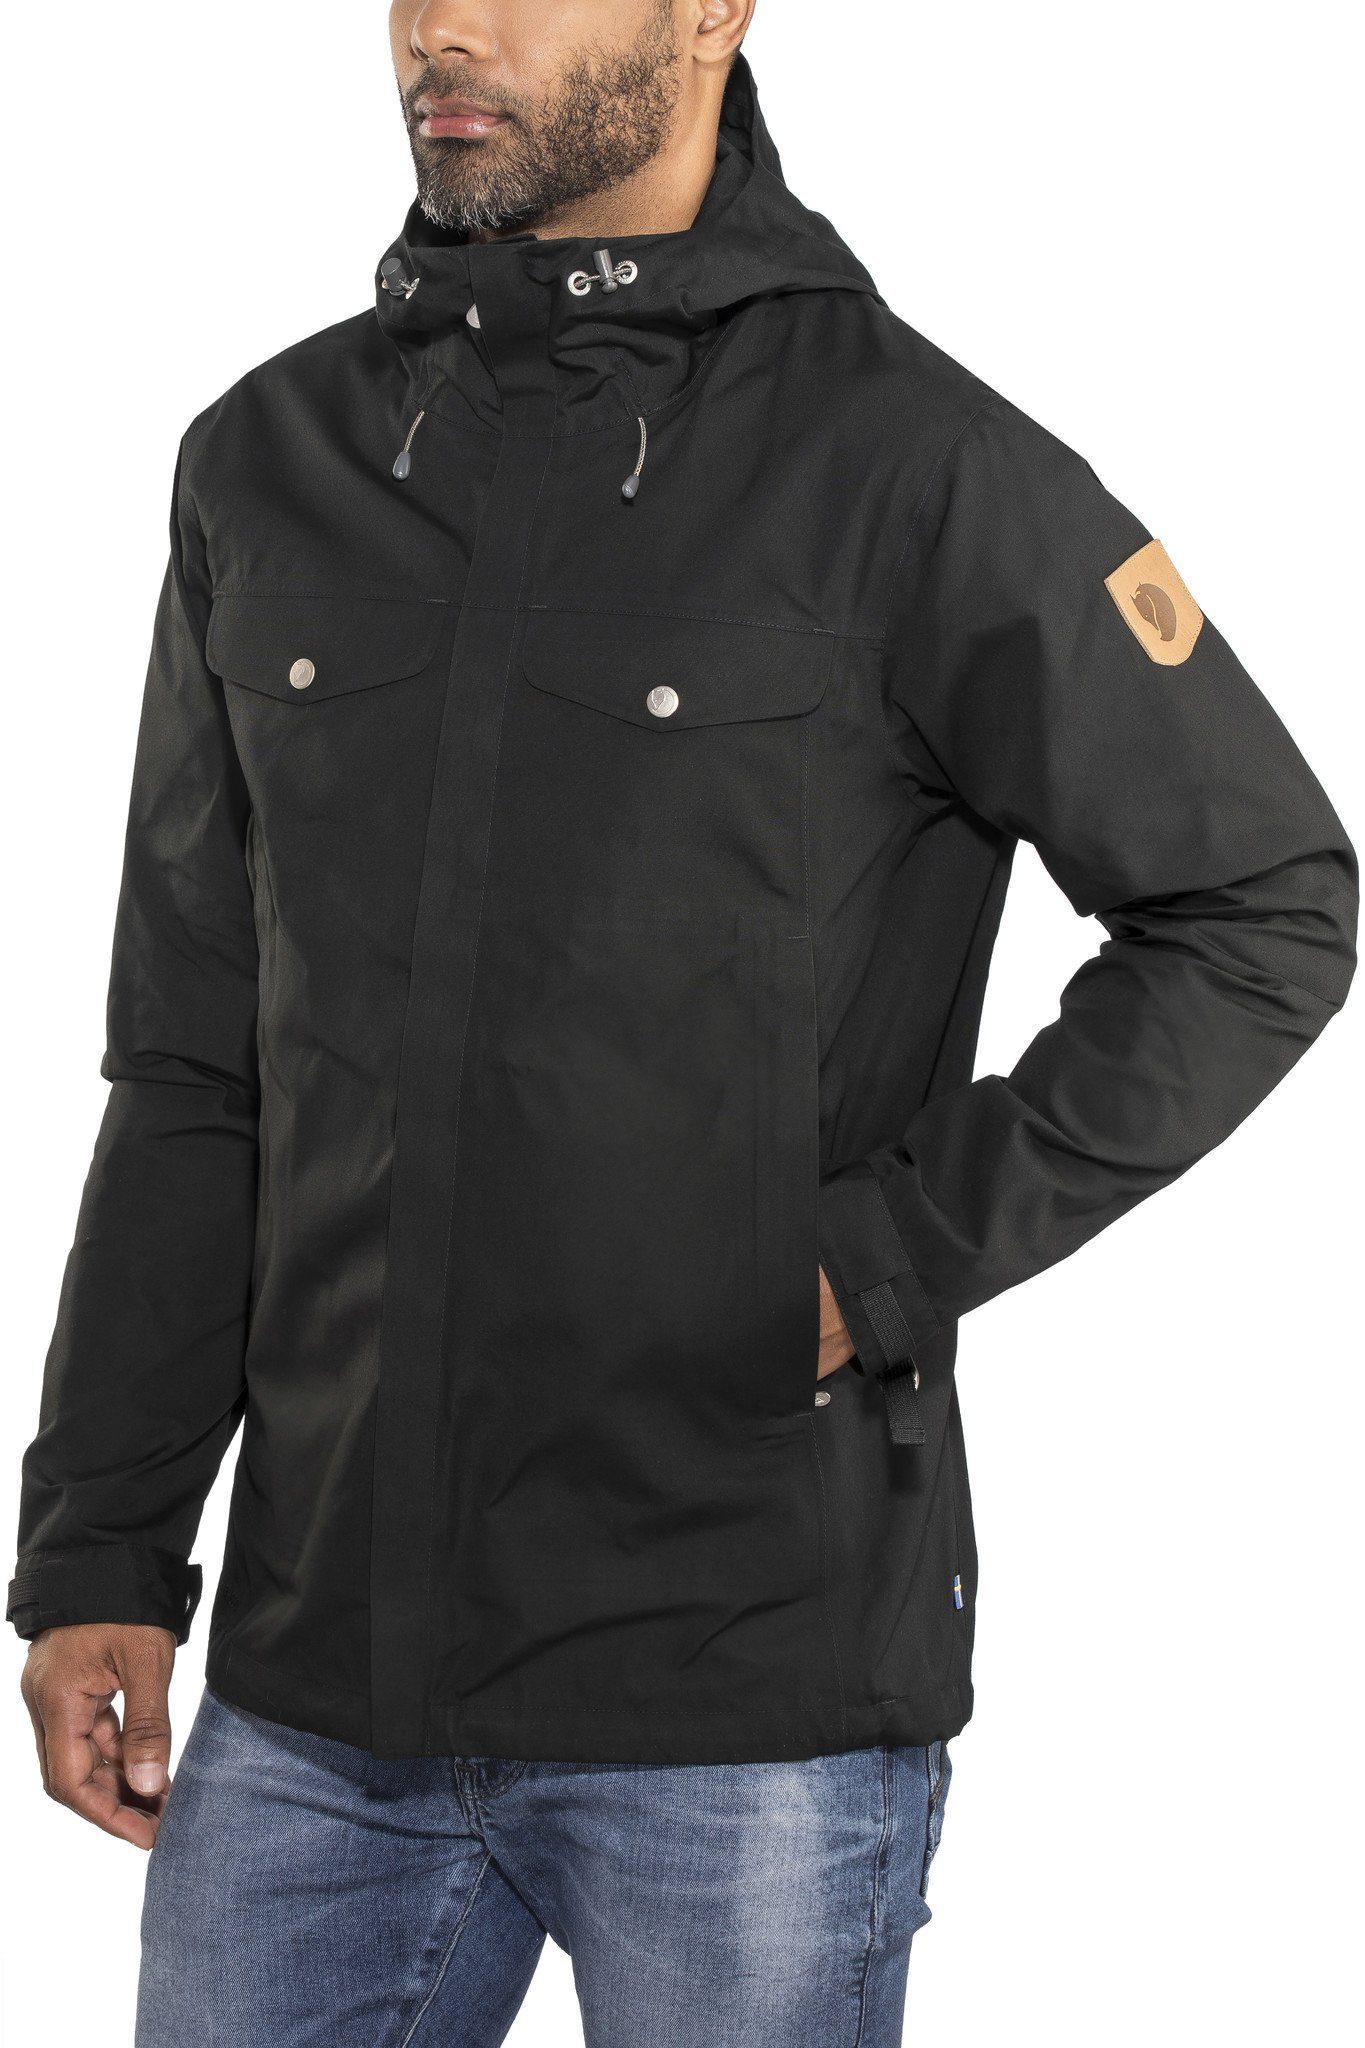 Half Outdoorjacke Online KaufenOtto Herren« »greenland Century Jacket Fjällräven xdCoeBWr